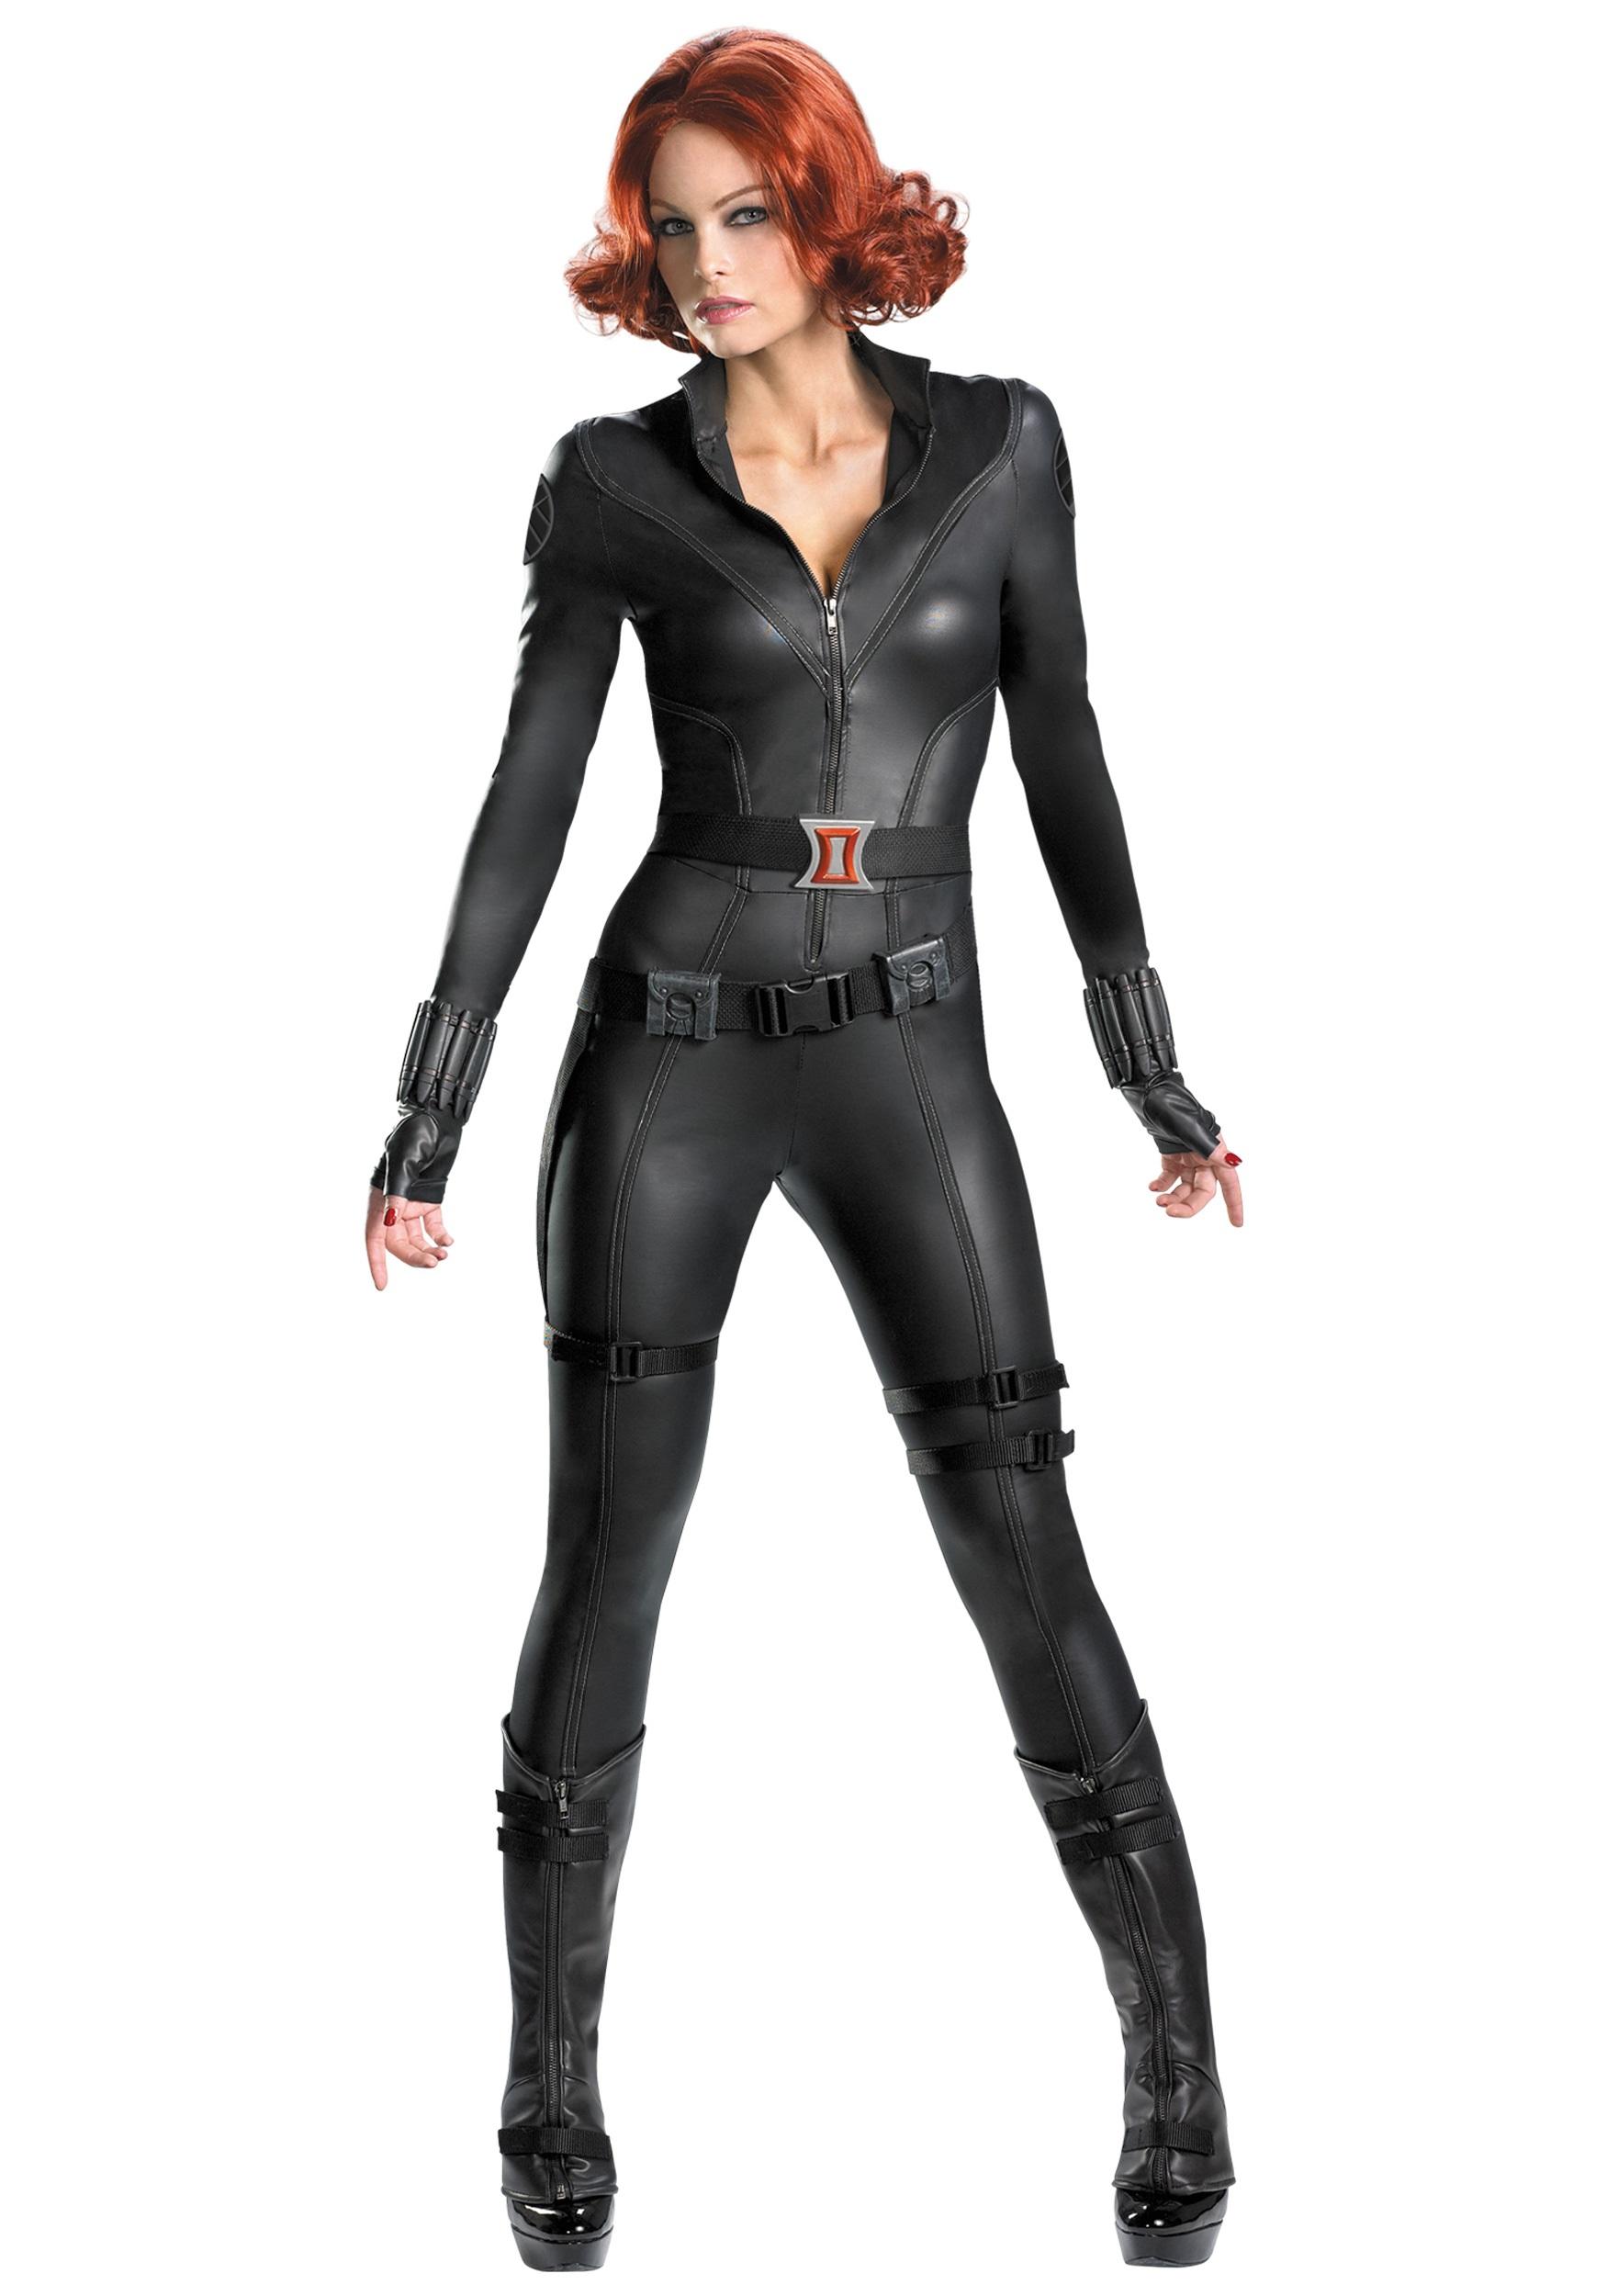 Avengers Replica Black Widow Costume